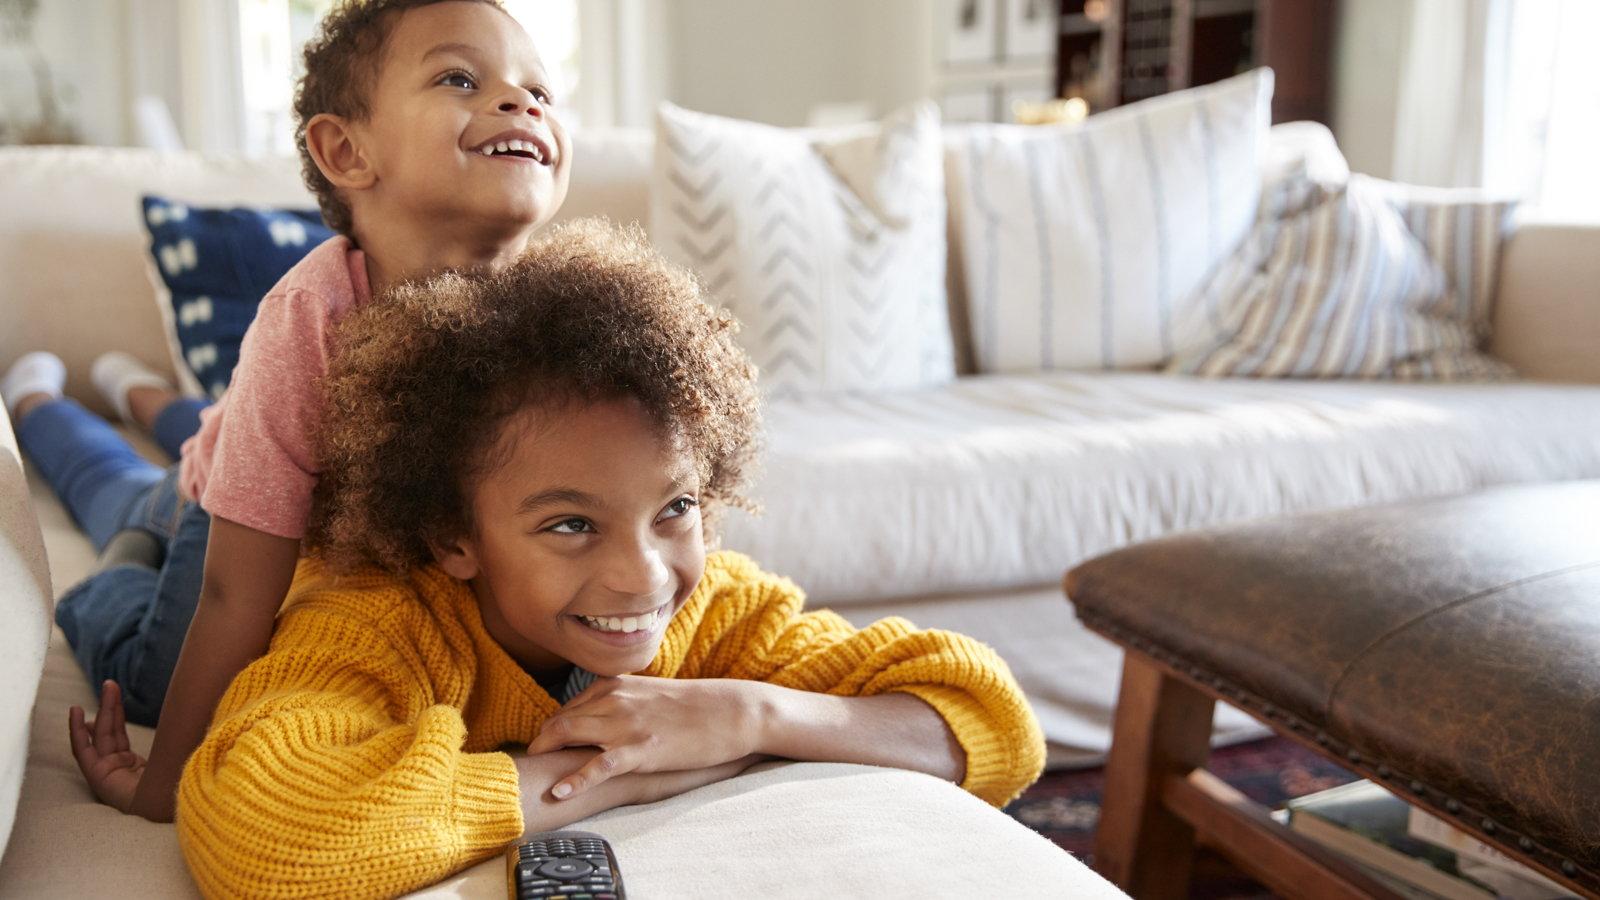 siblings watching television